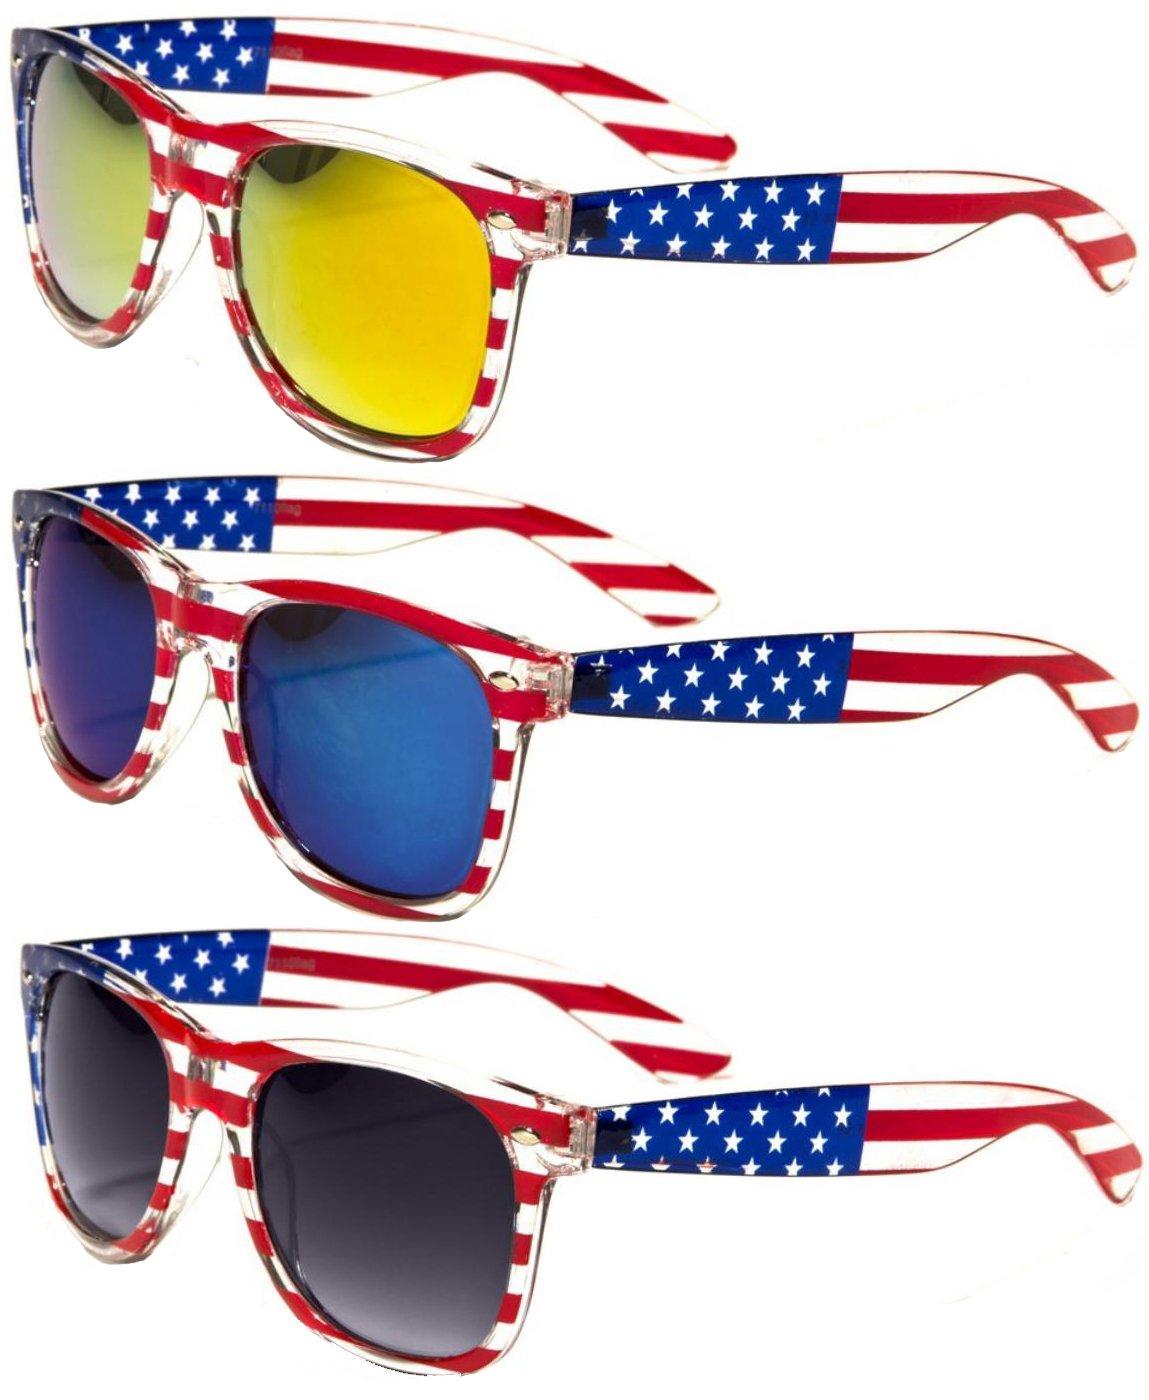 Classic American Patriot Flag Wayfarer Style Sunglasses USA (all 3 pairs)